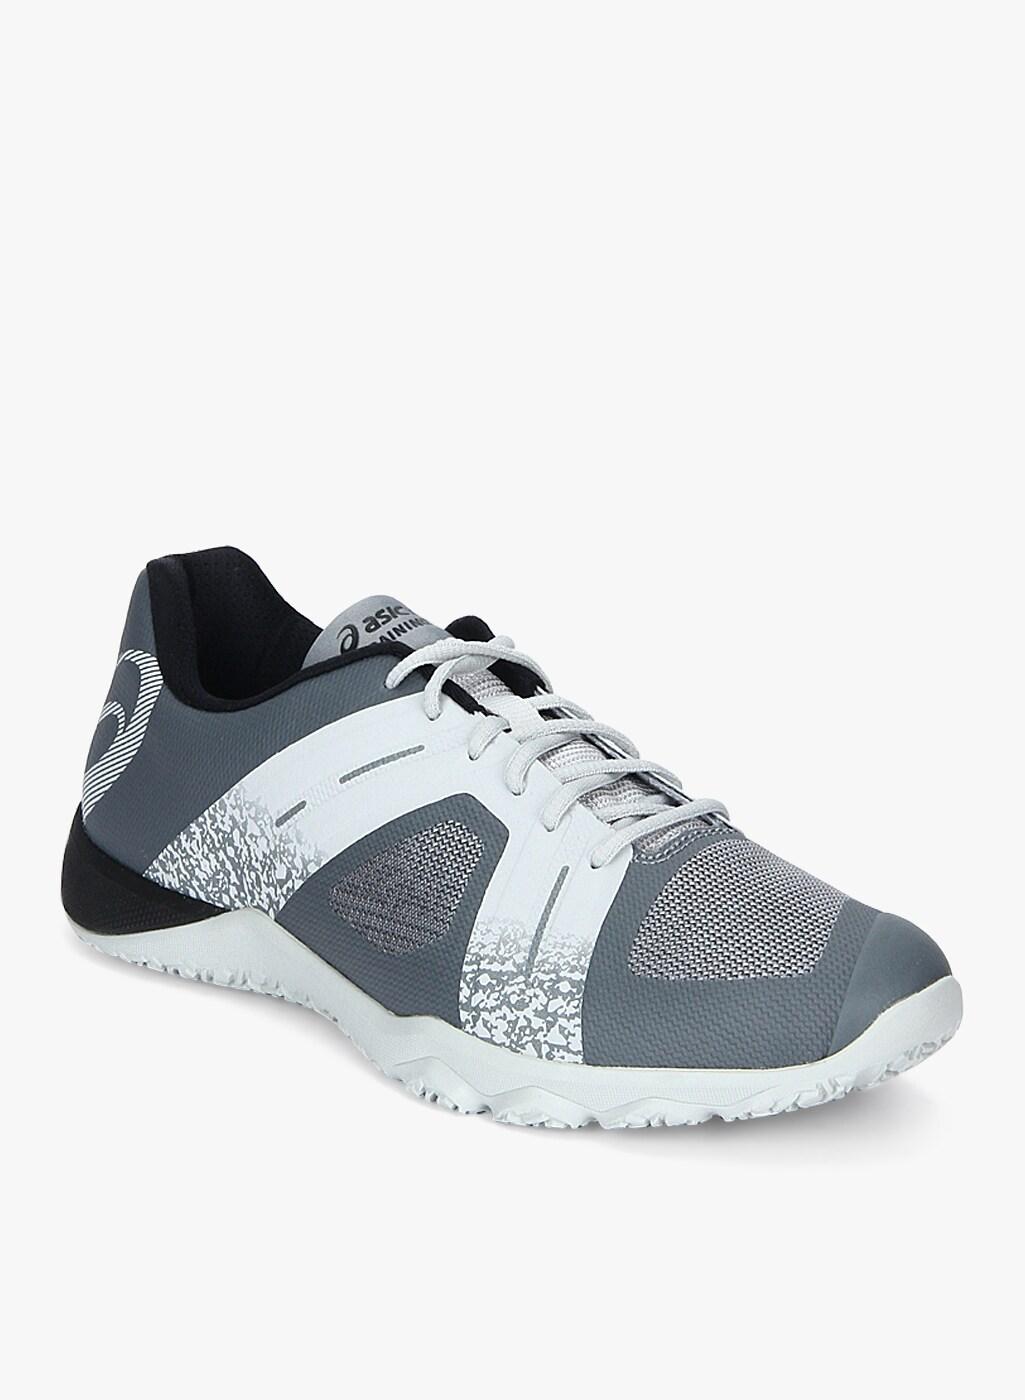 ASICS Conviction X 2 Grey Training Shoes